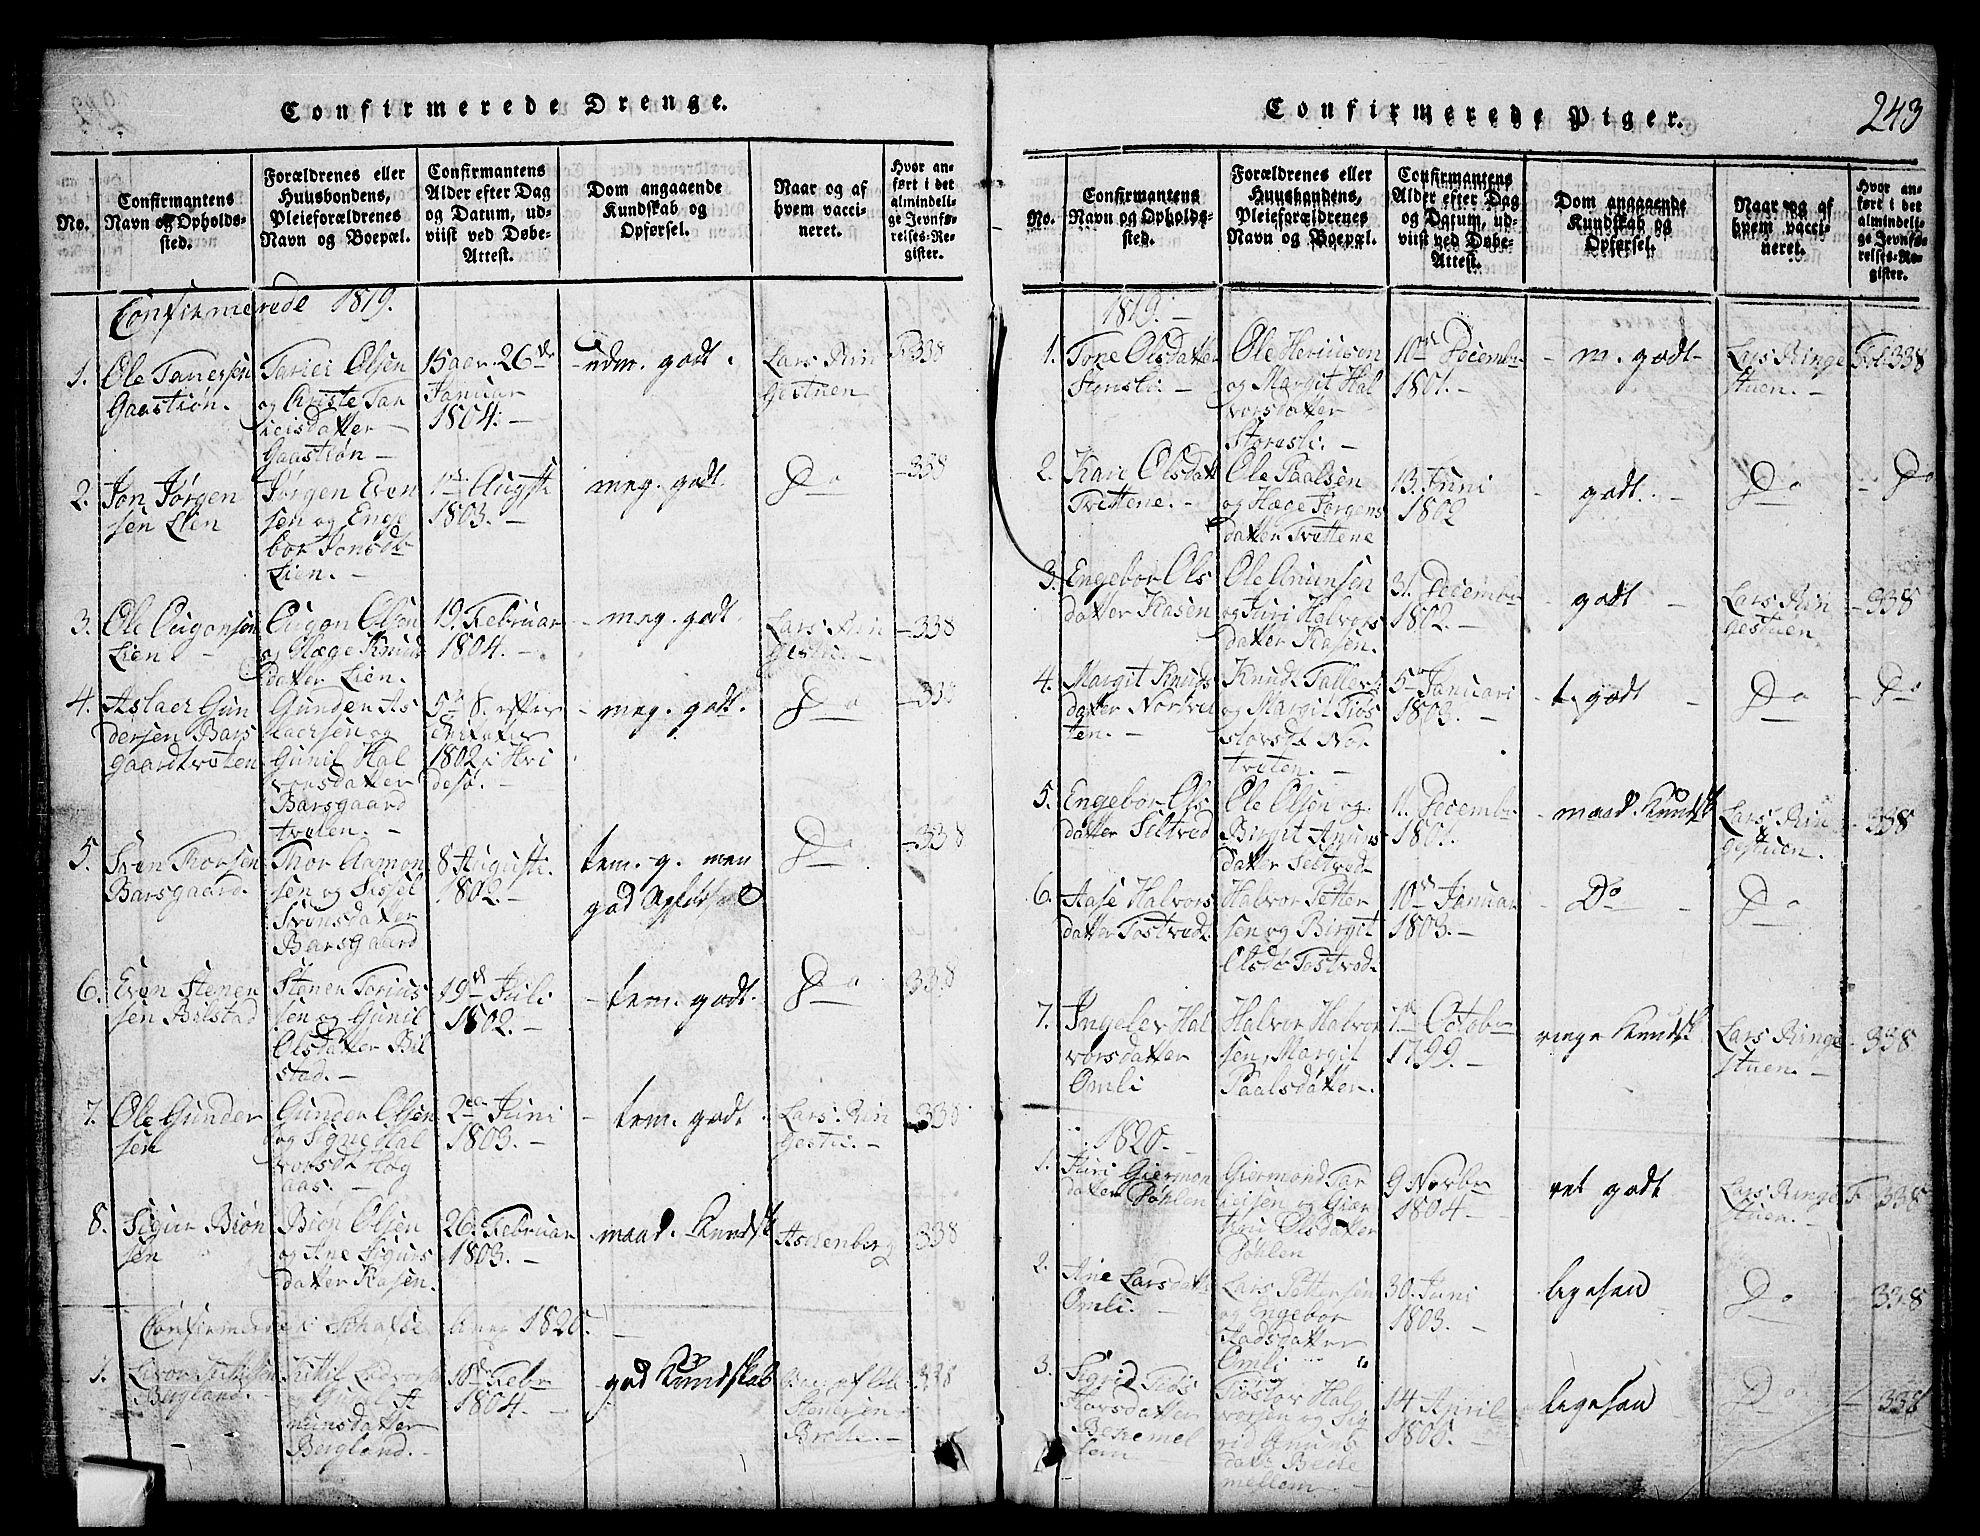 SAKO, Mo kirkebøker, G/Gb/L0001: Klokkerbok nr. II 1, 1814-1843, s. 243